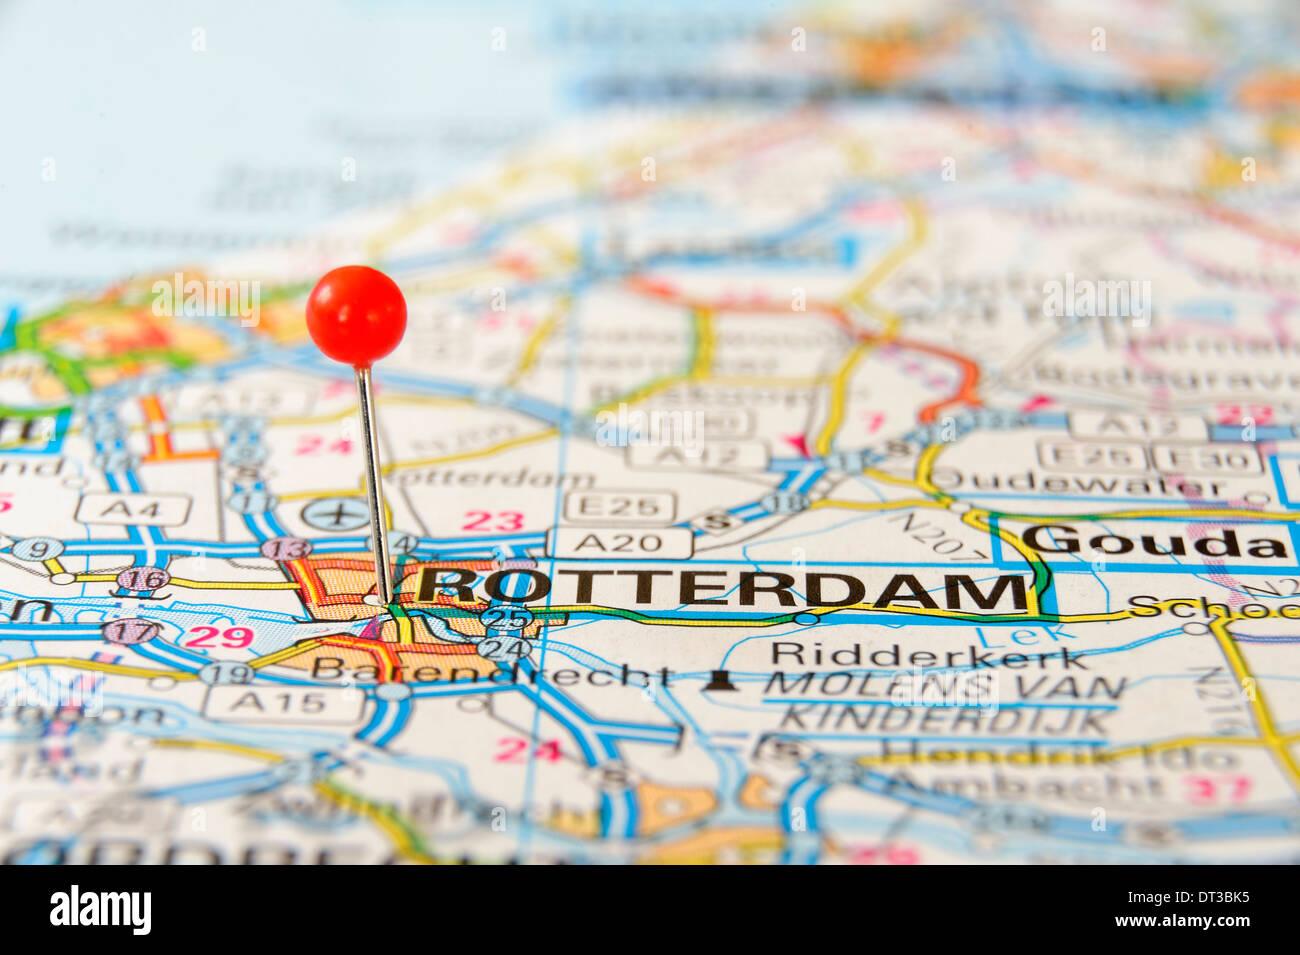 Rotterdam On The Map Stock Photo 66457865 Alamy